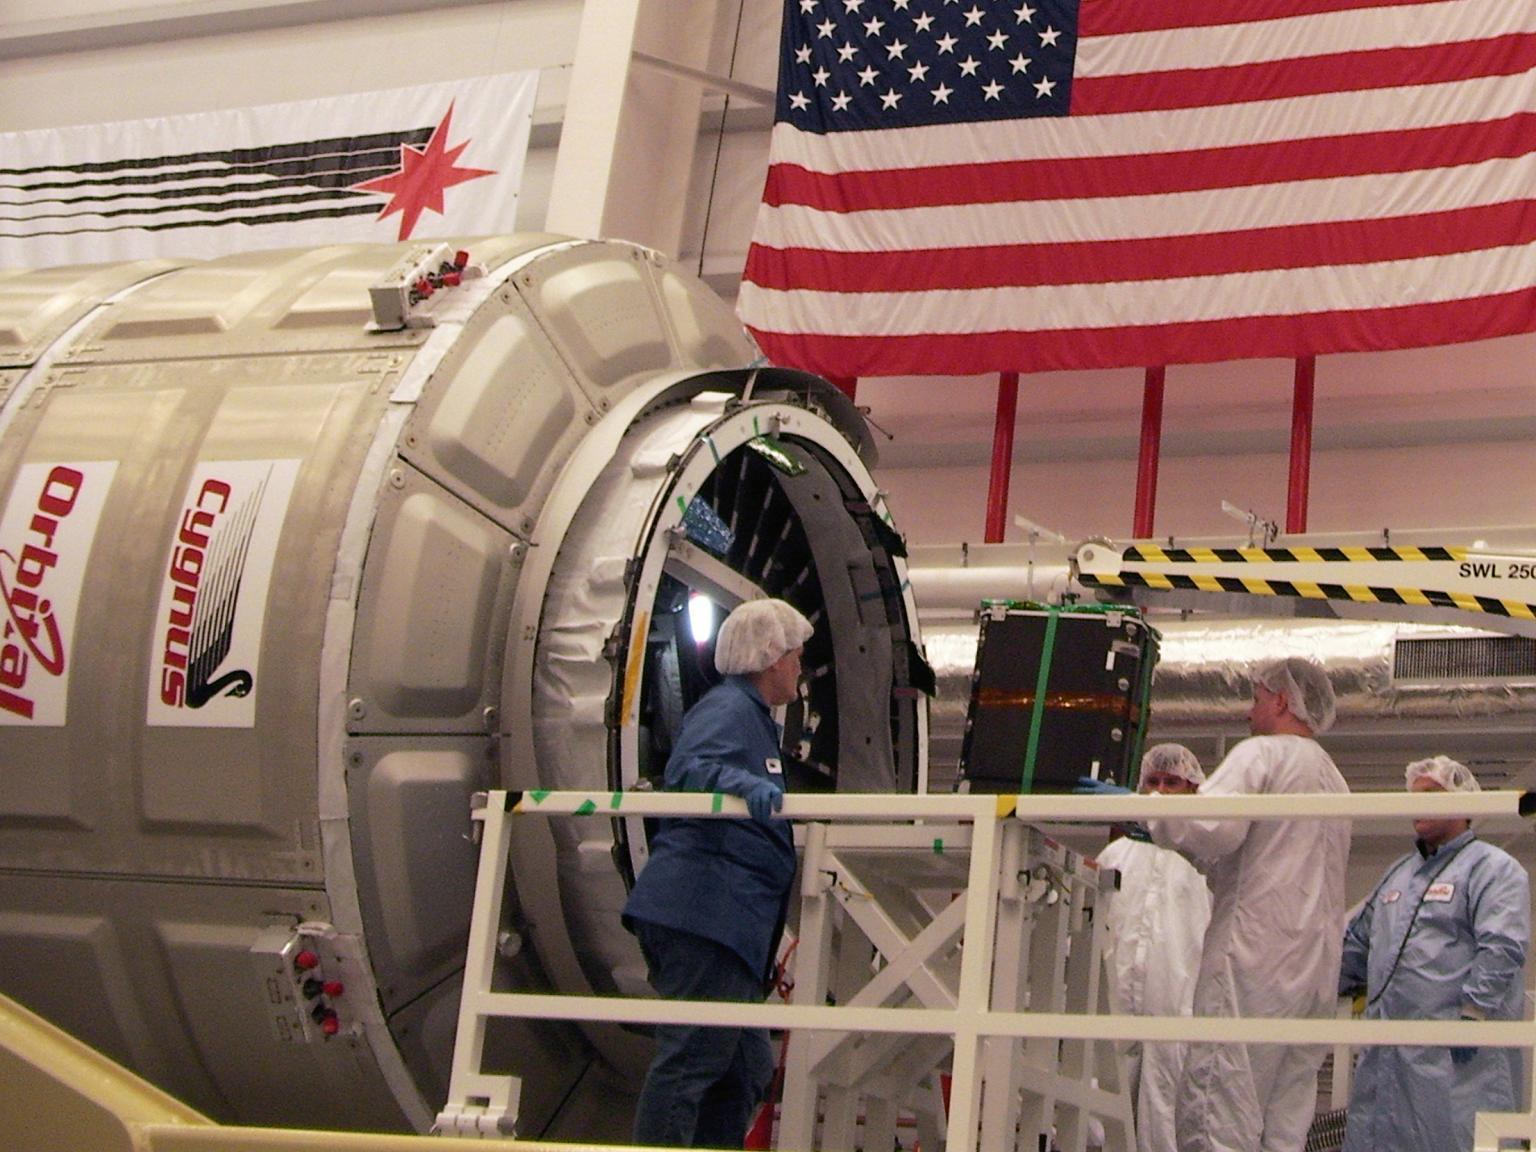 The unmanned spacecraft Cygnus